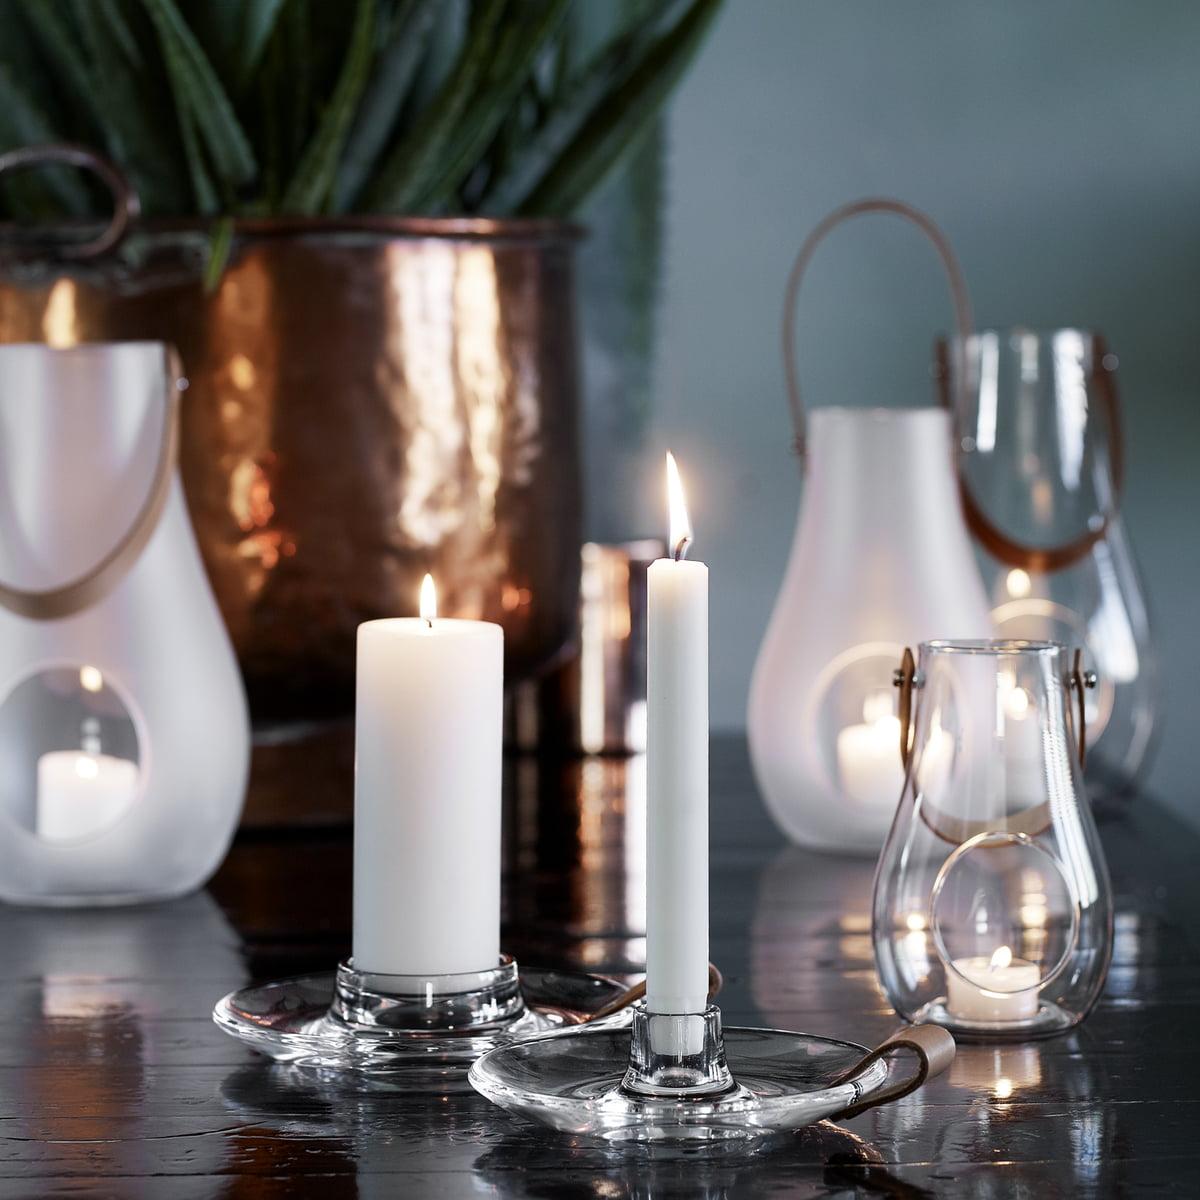 Design-with-Light-Kerzenhalter-beide-Groessen-Ambiente-2.jpg